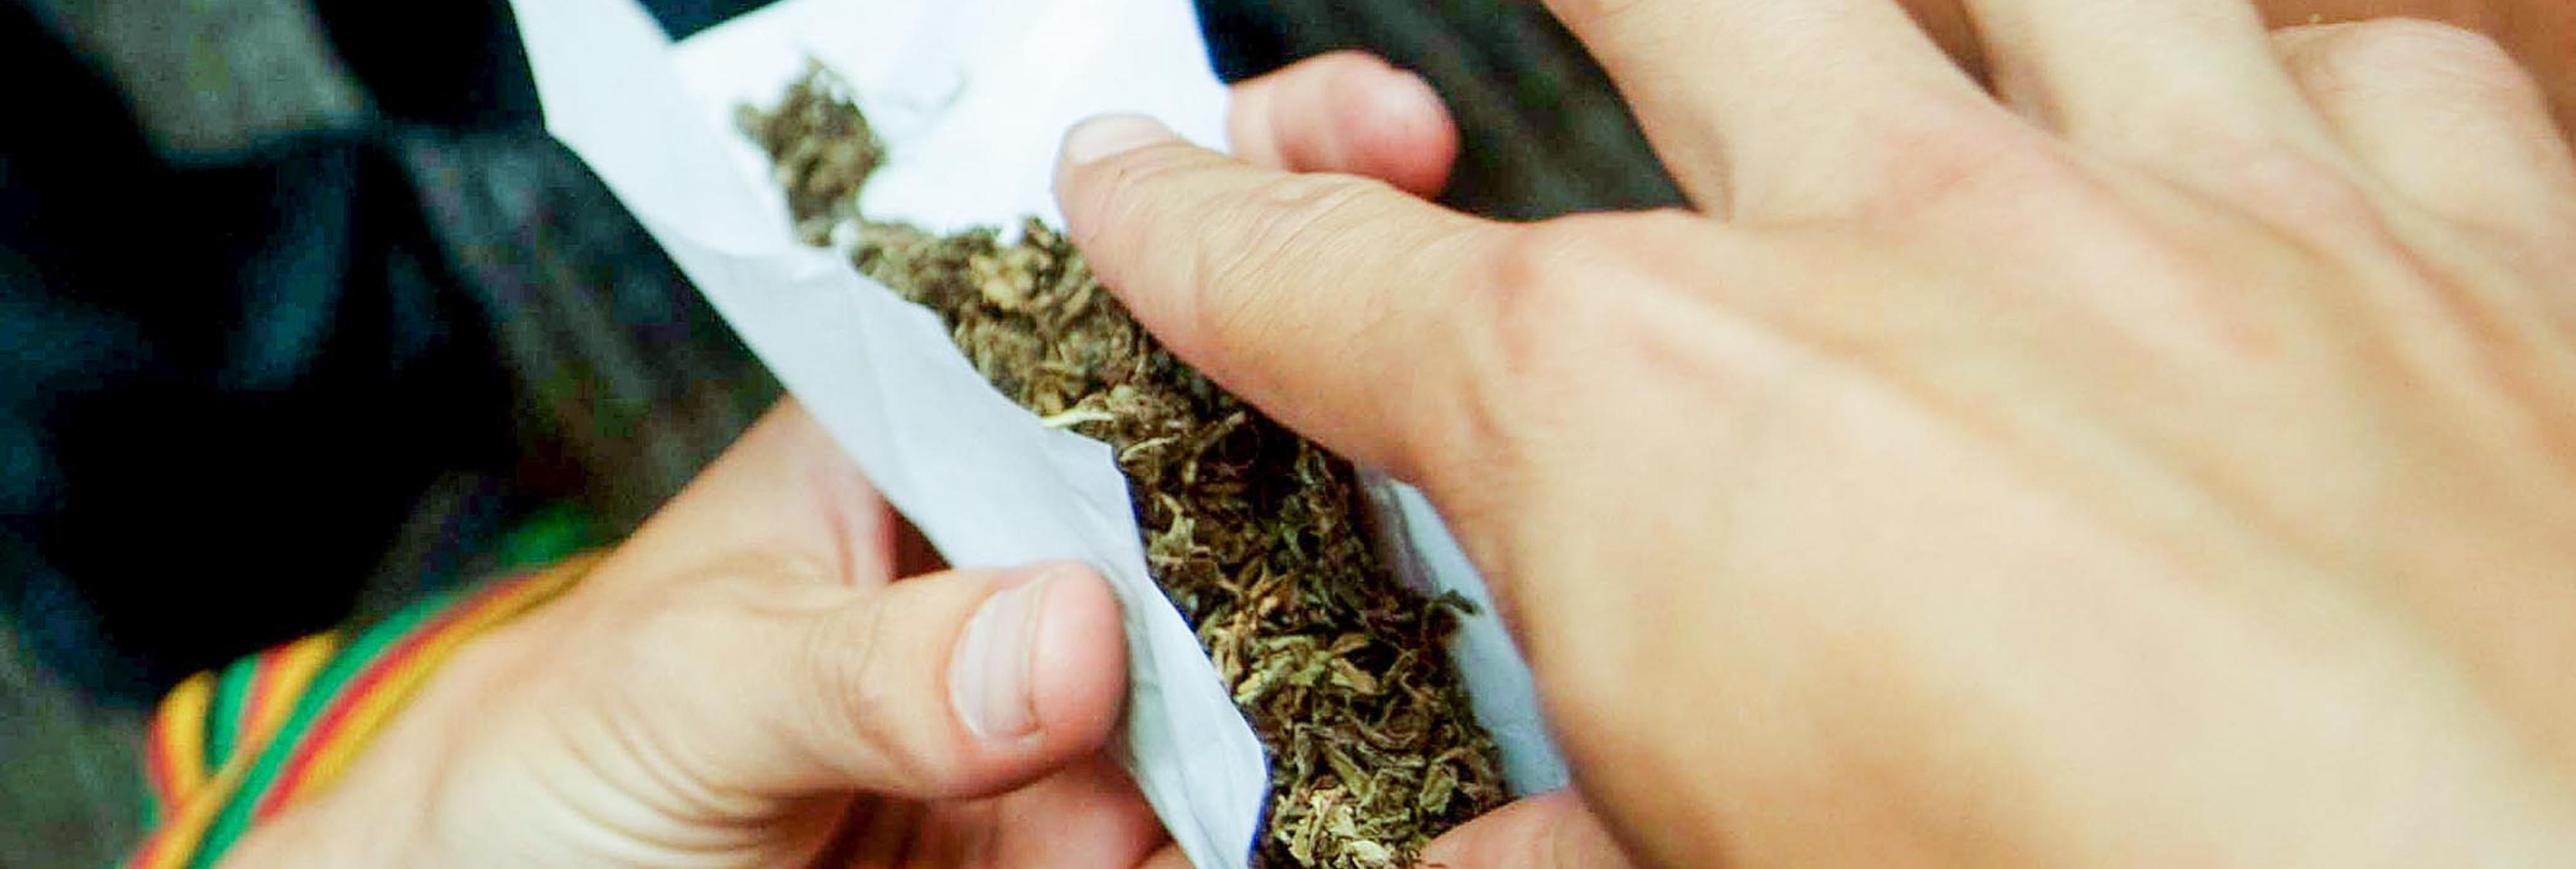 7 motivos para legalizar la marihuana